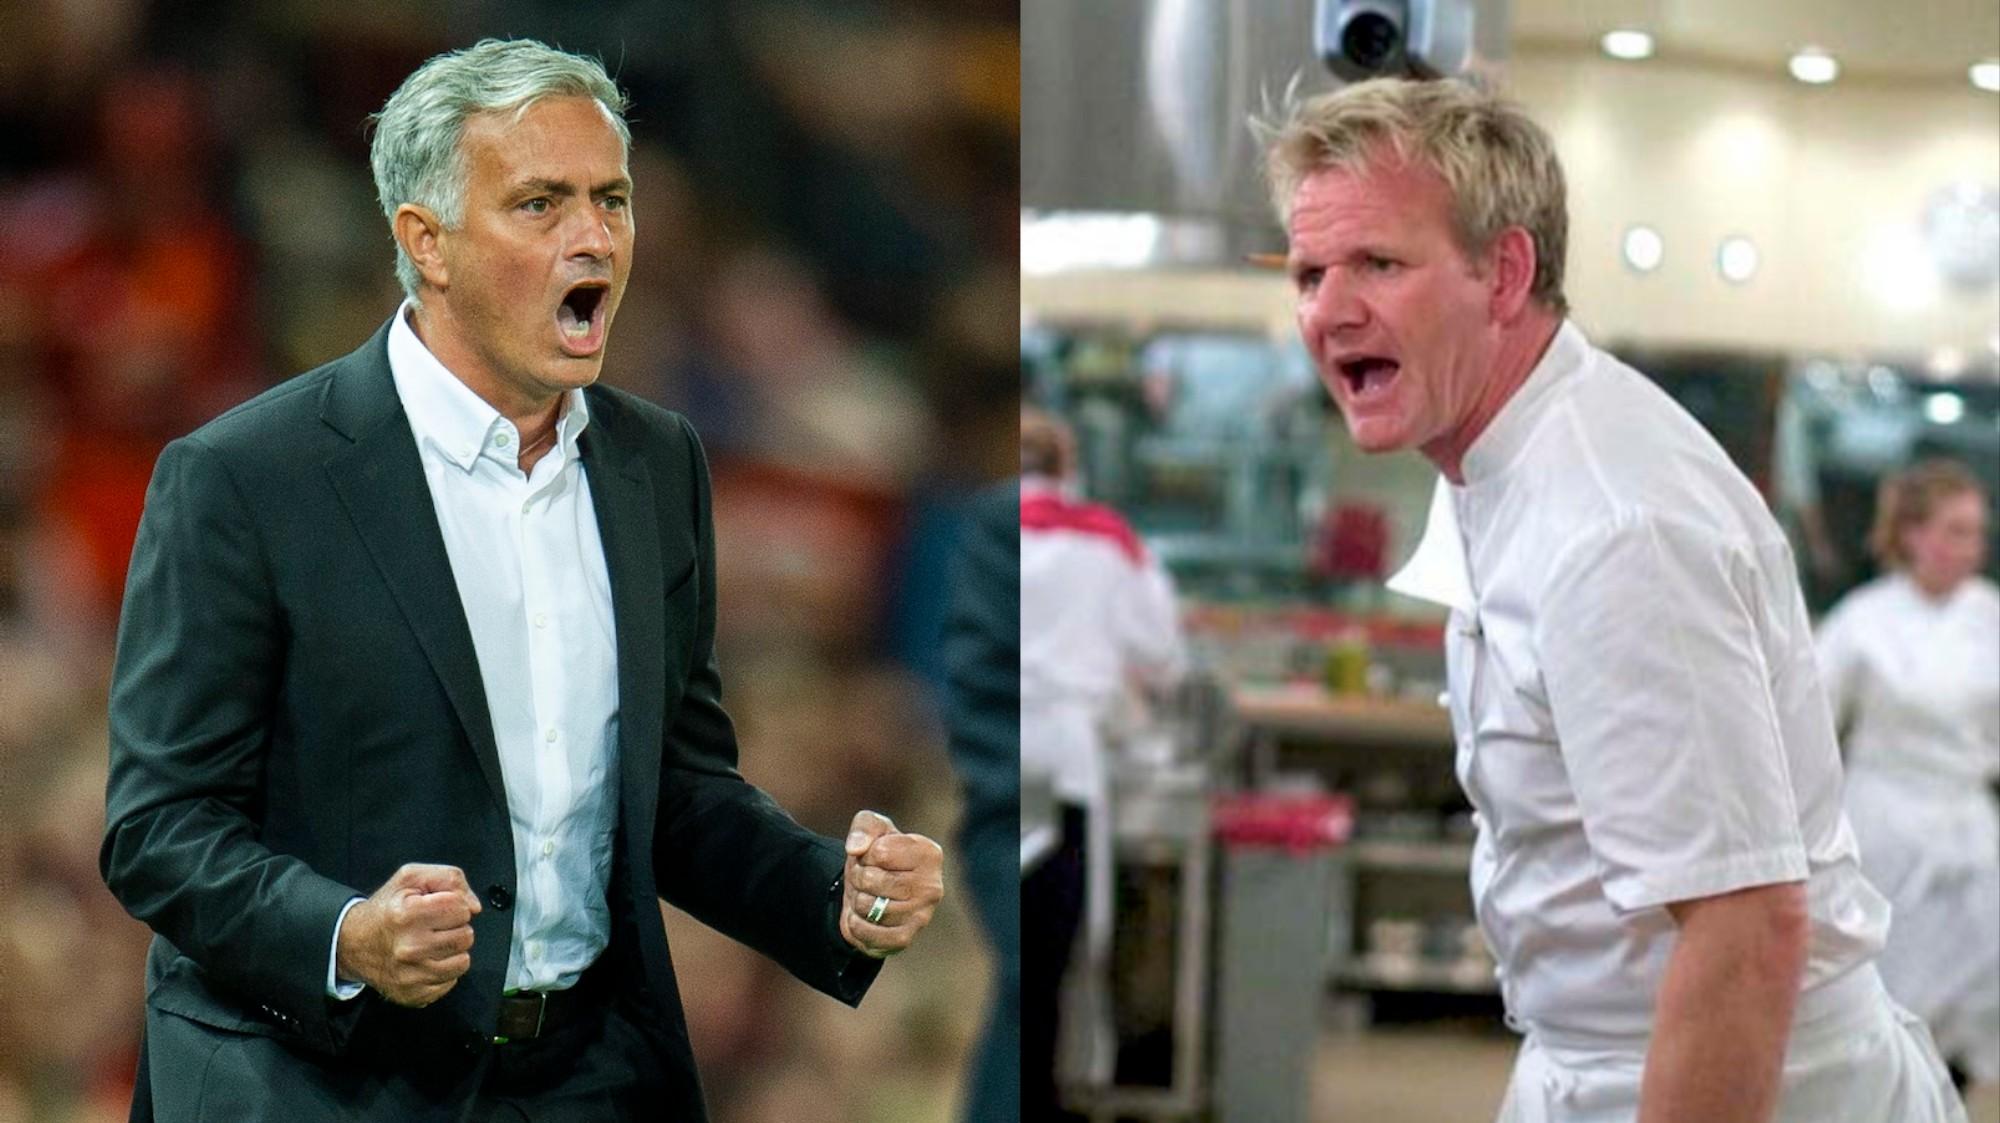 This Gordon Ramsay-Jose Mourinho Meme is Perfect - VICE